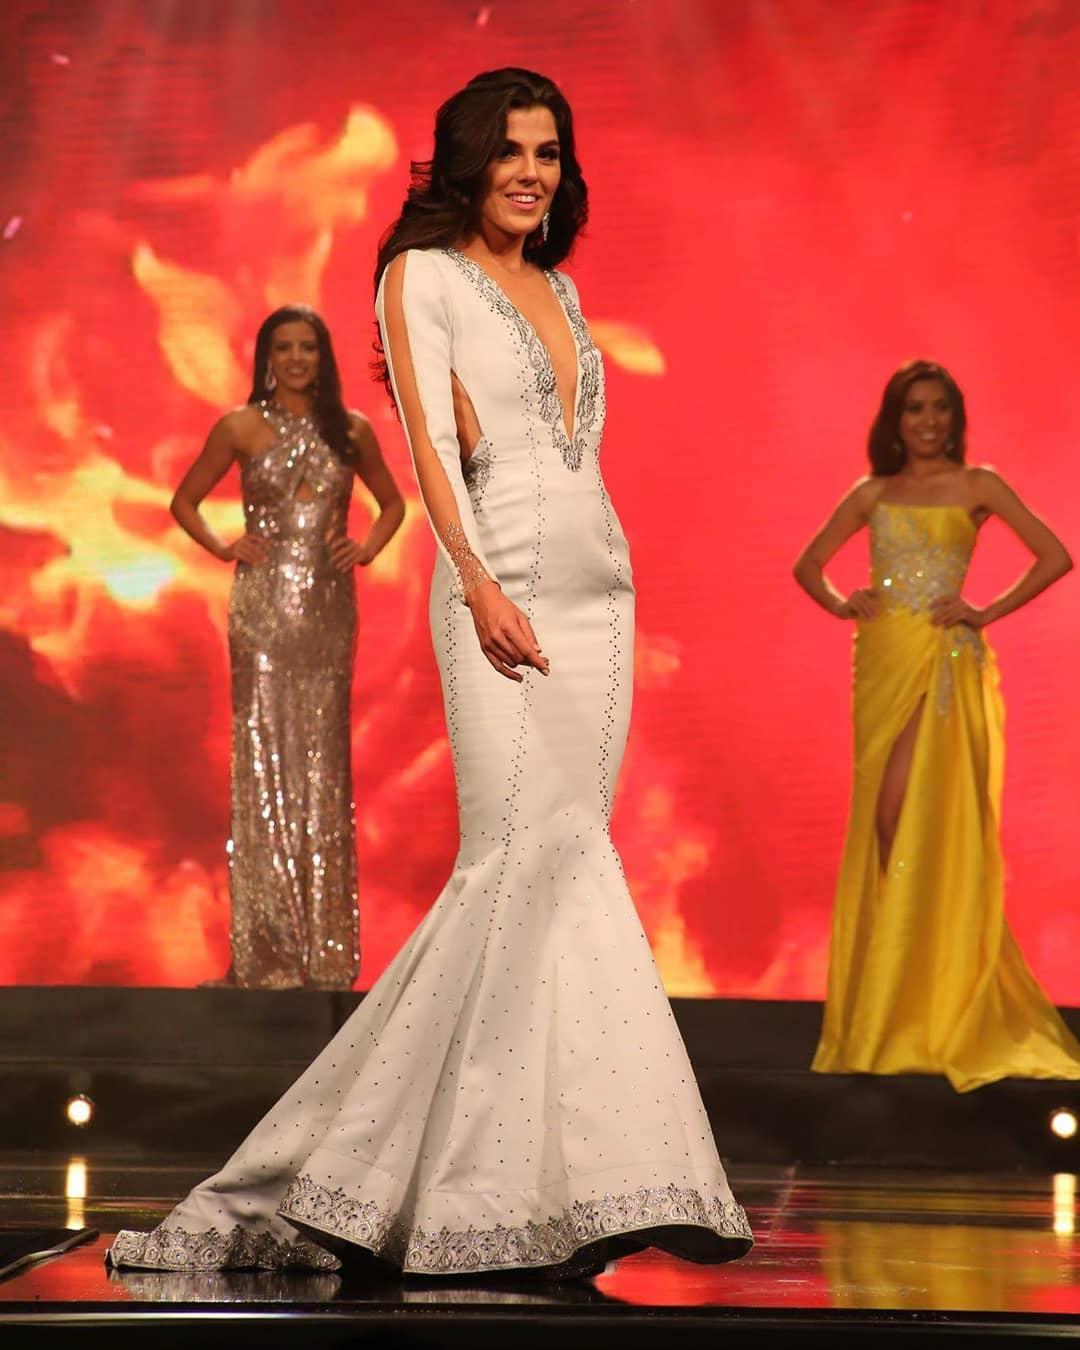 cynthia ruz lopez escobar, 3rd runner-up de miss continentes unidos 2018. - Página 4 41308010